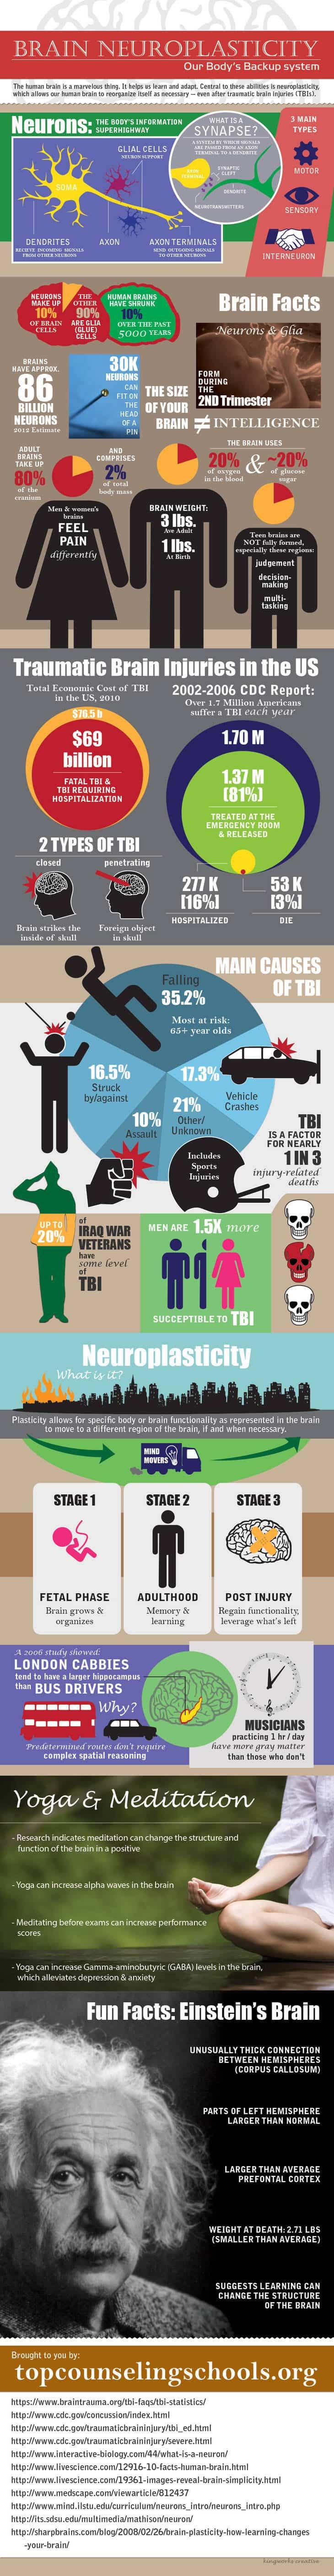 Infographic - Brain neuroplasticity infographic